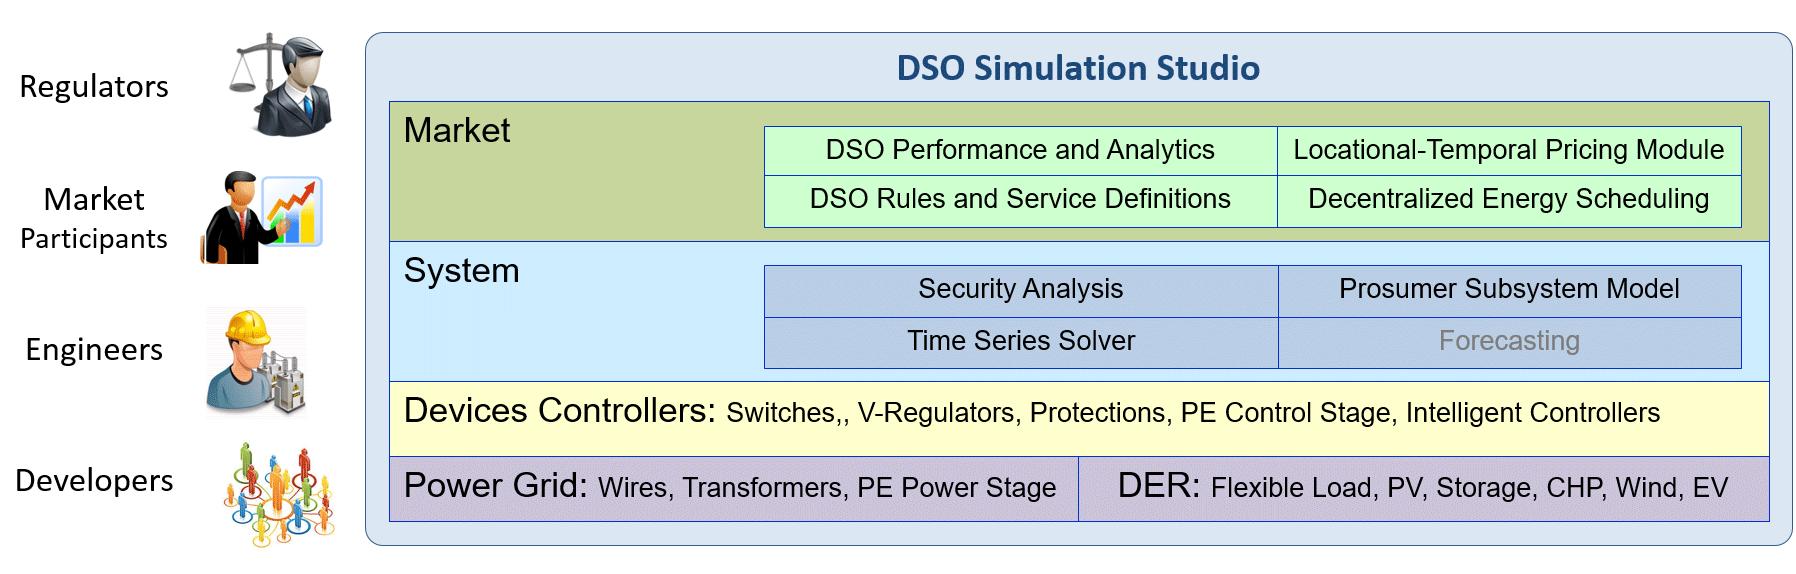 DSO Simulation Studio illustration